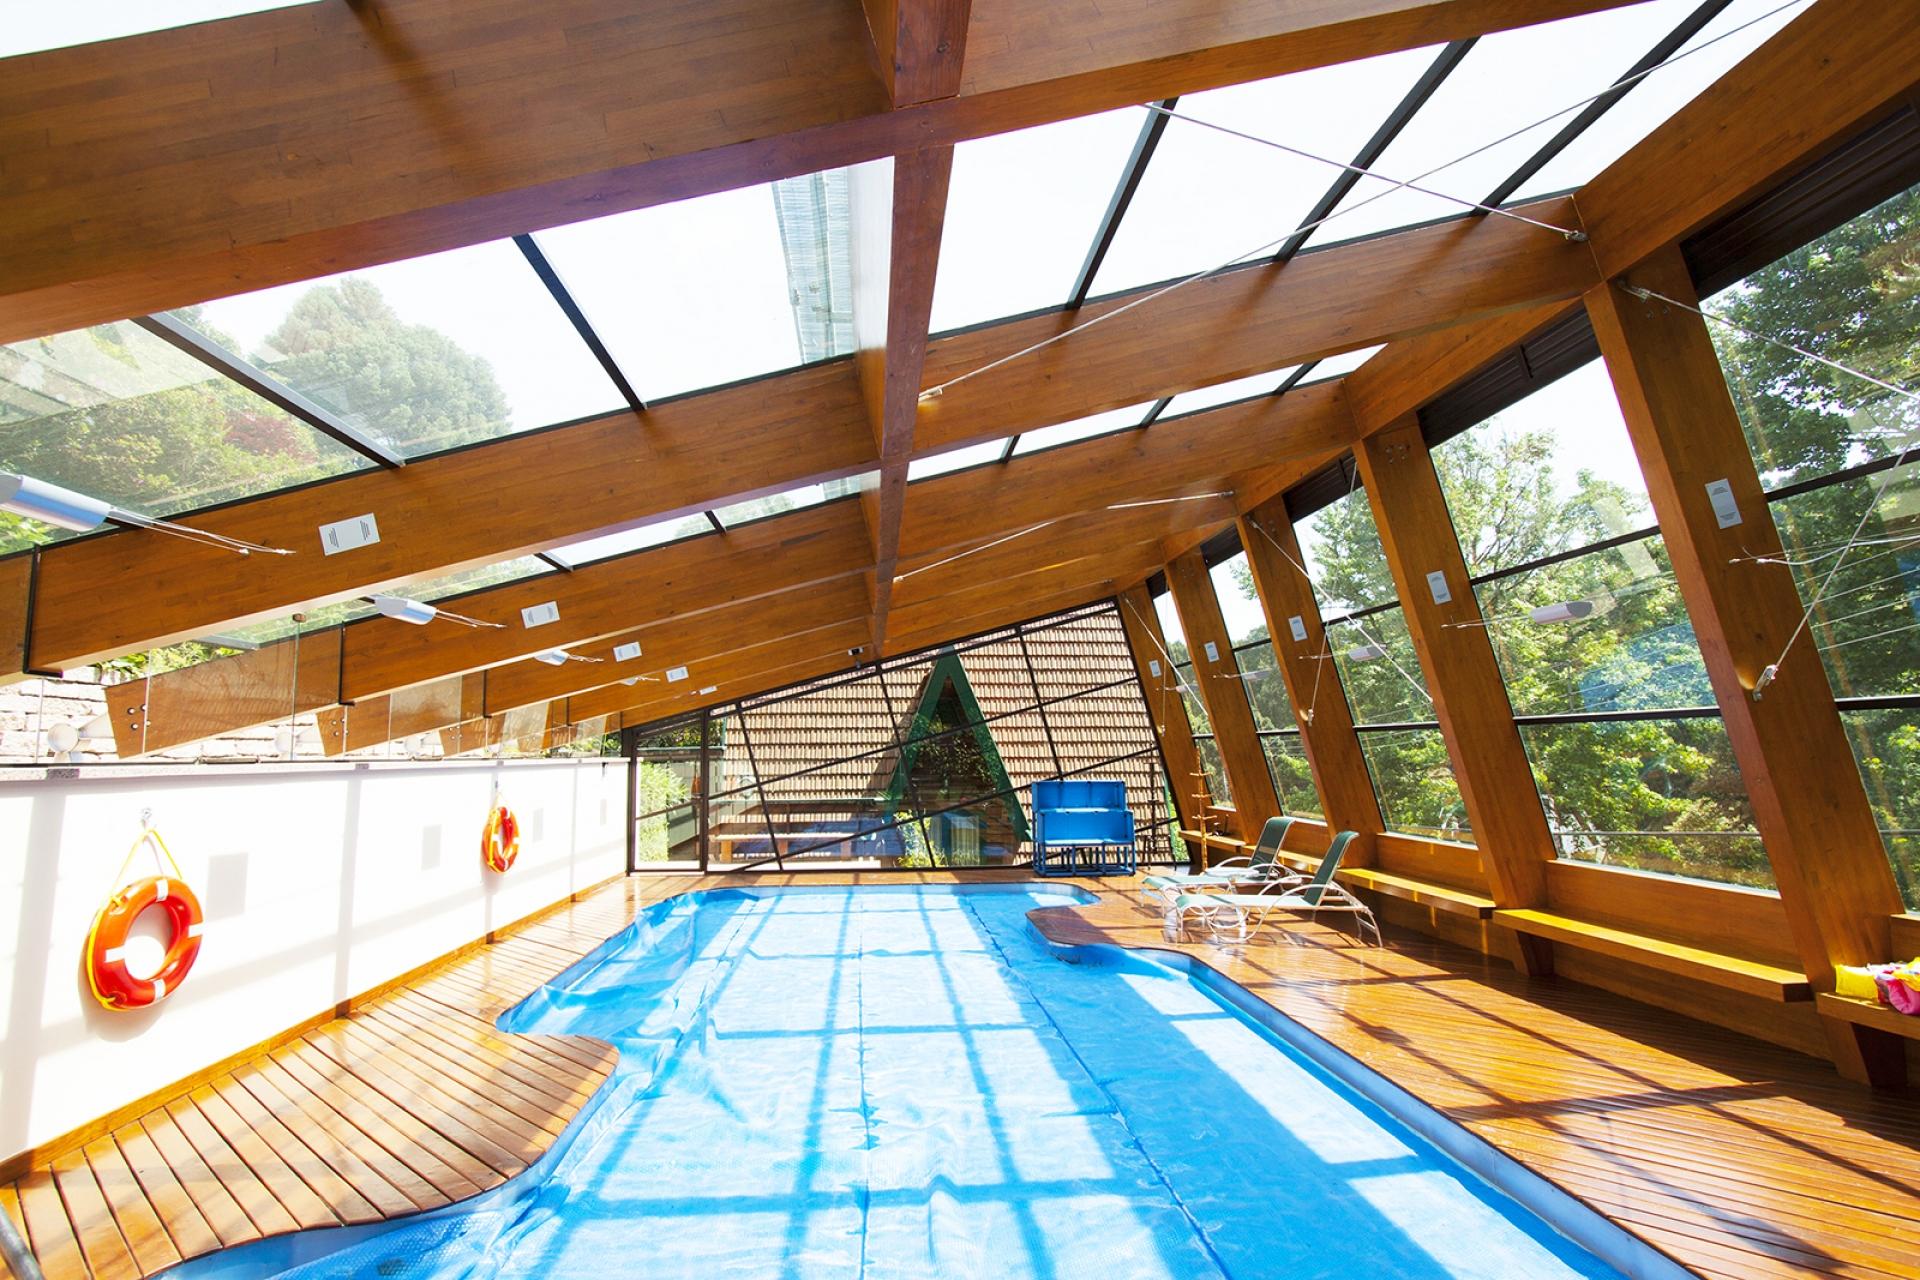 zeppelini associados cobertura piscina